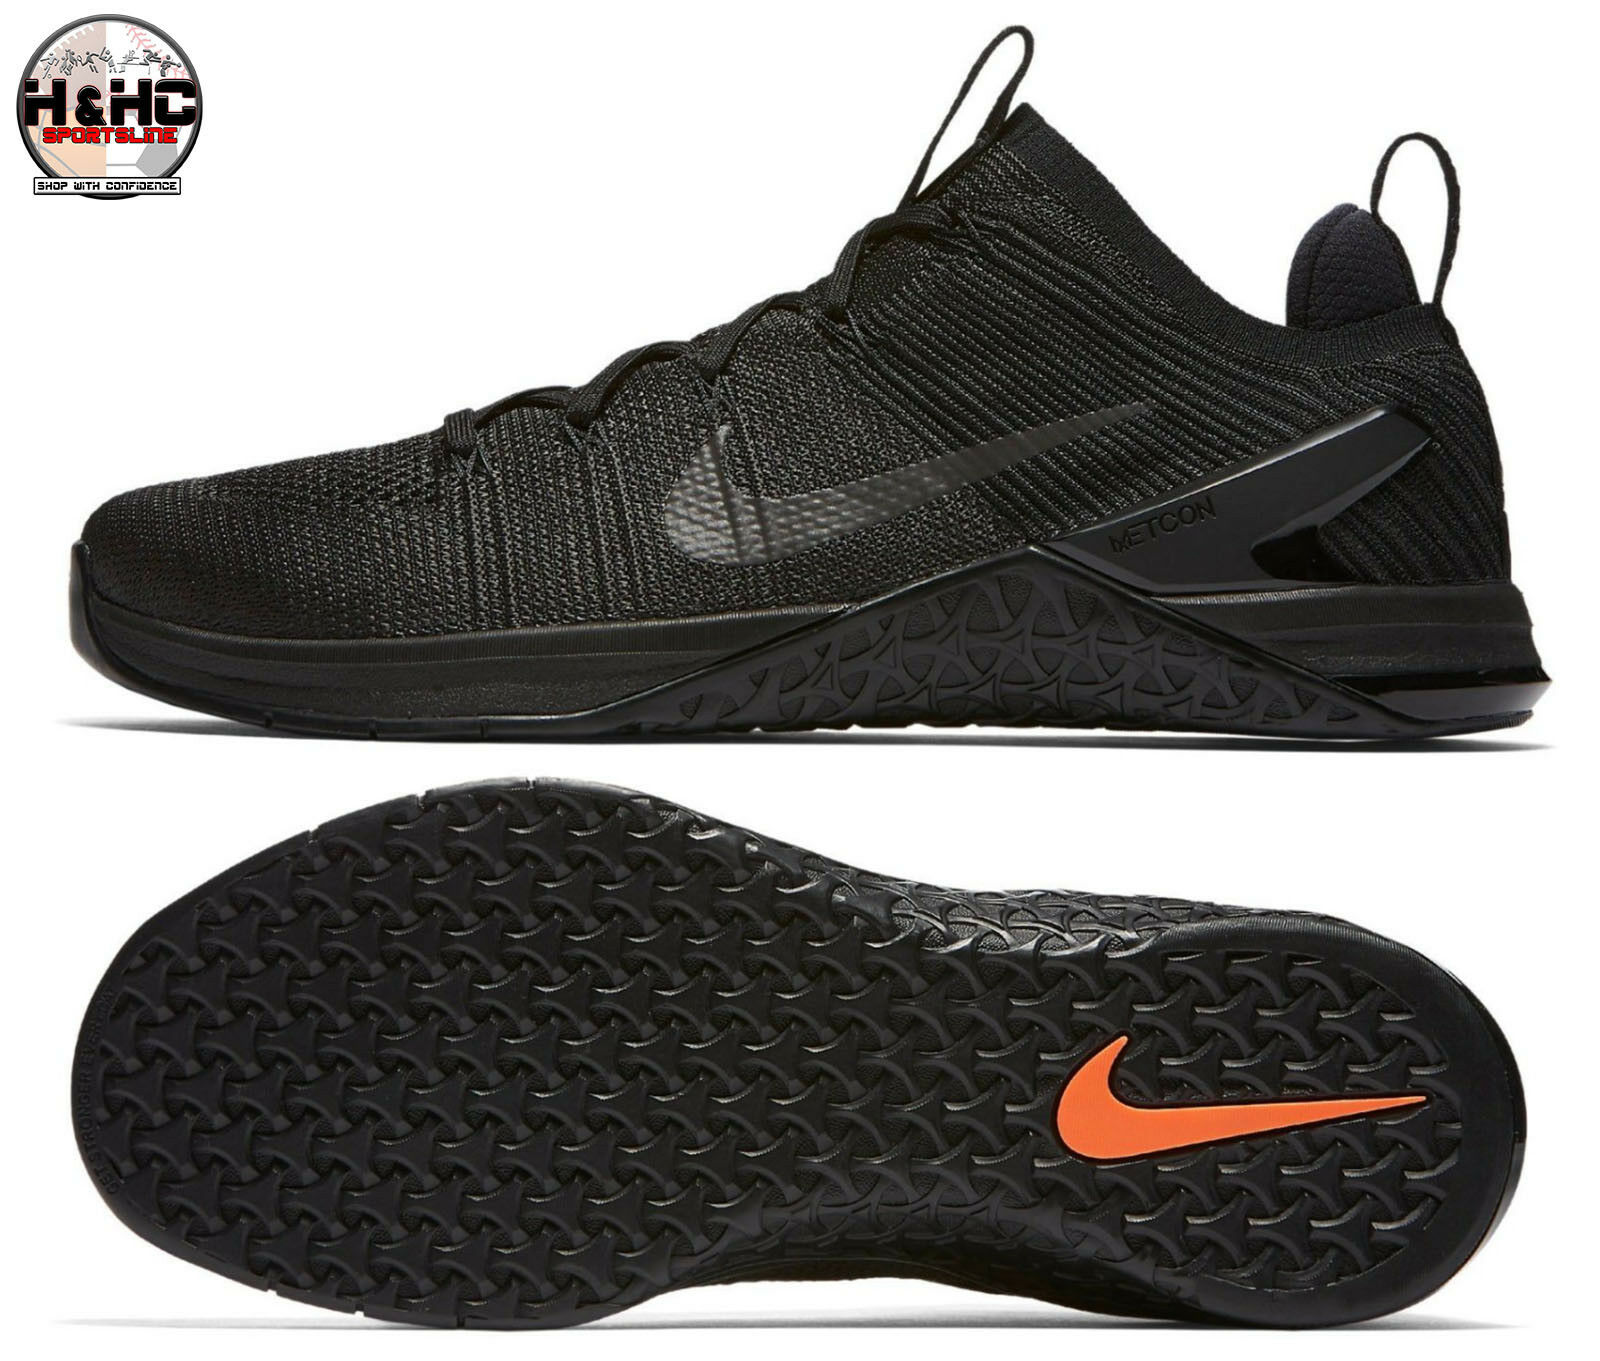 Nike Metcon DSX Flyknit 2 Black 924423 004 Men Training Weightlifting Shoe Sz 11